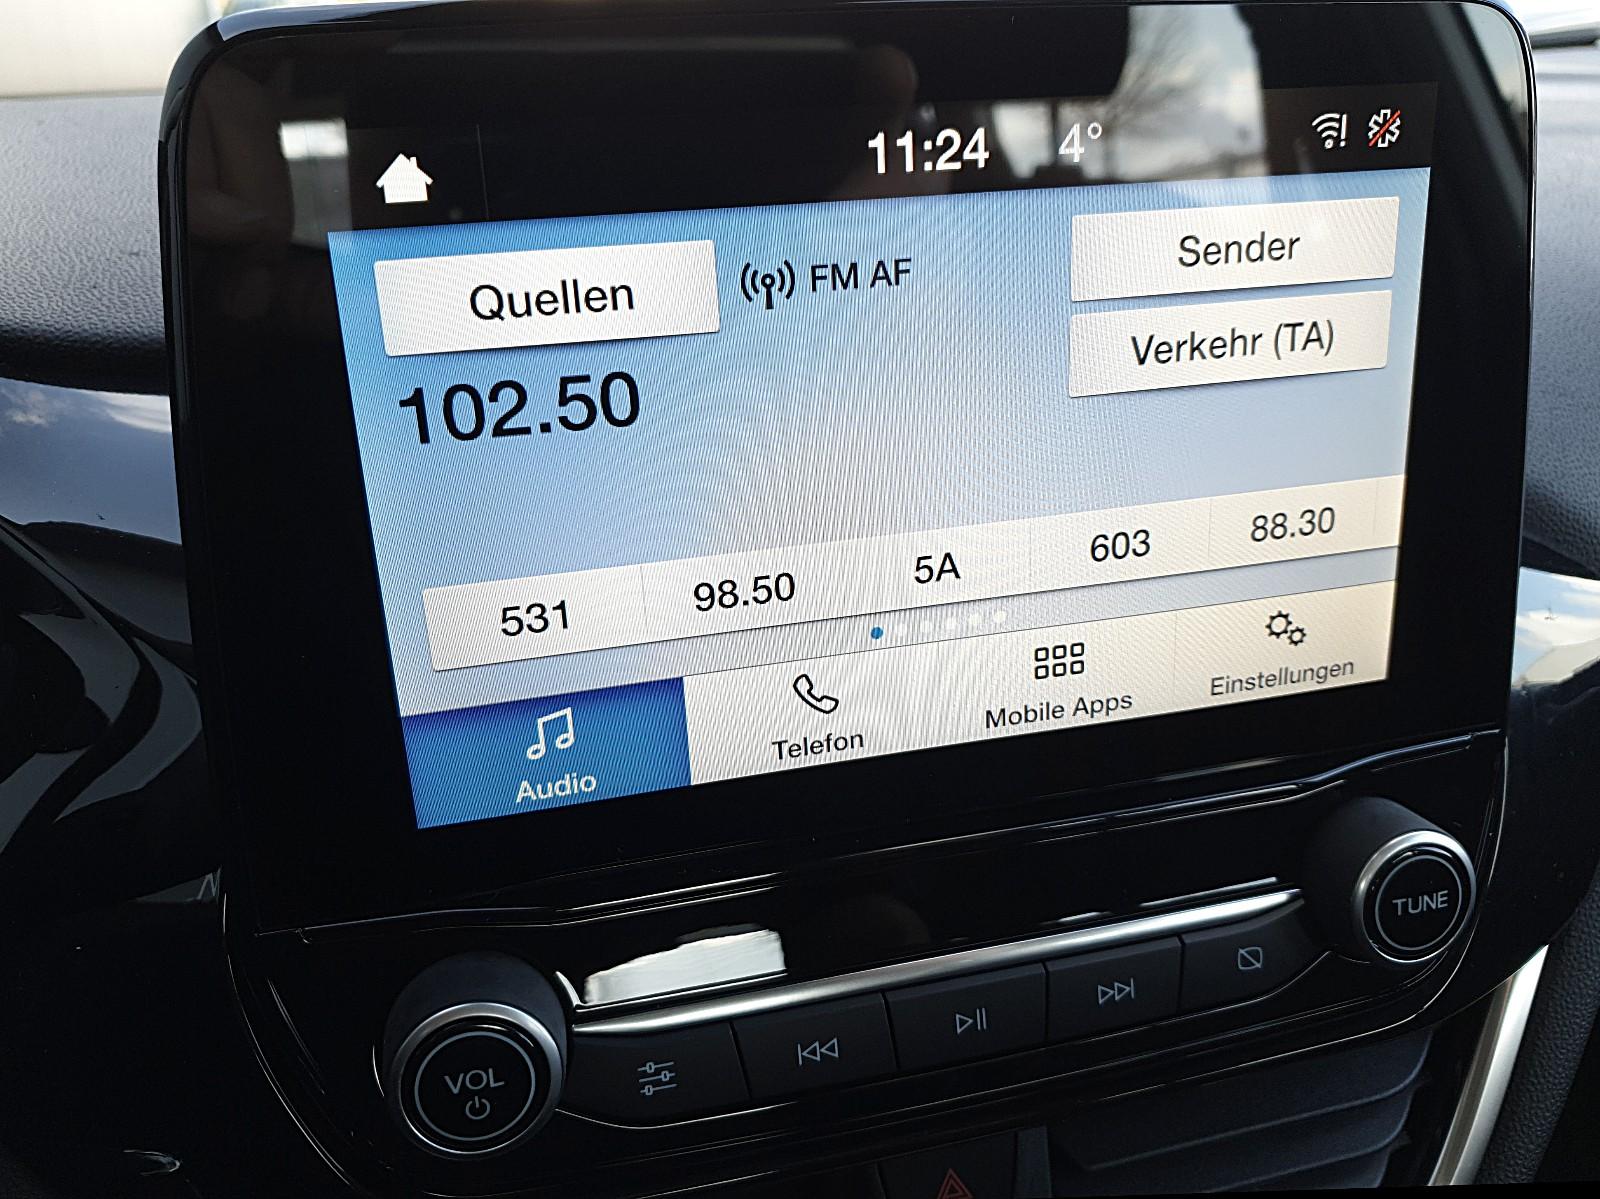 FORD FIESTA 1.1 85PS Trend 5-Türig Klima Bluetooth PDC DAB+ Allwetterreifen Viscaal Fahrzeuggrosshandel GmbH, D-49847 Itterbeck